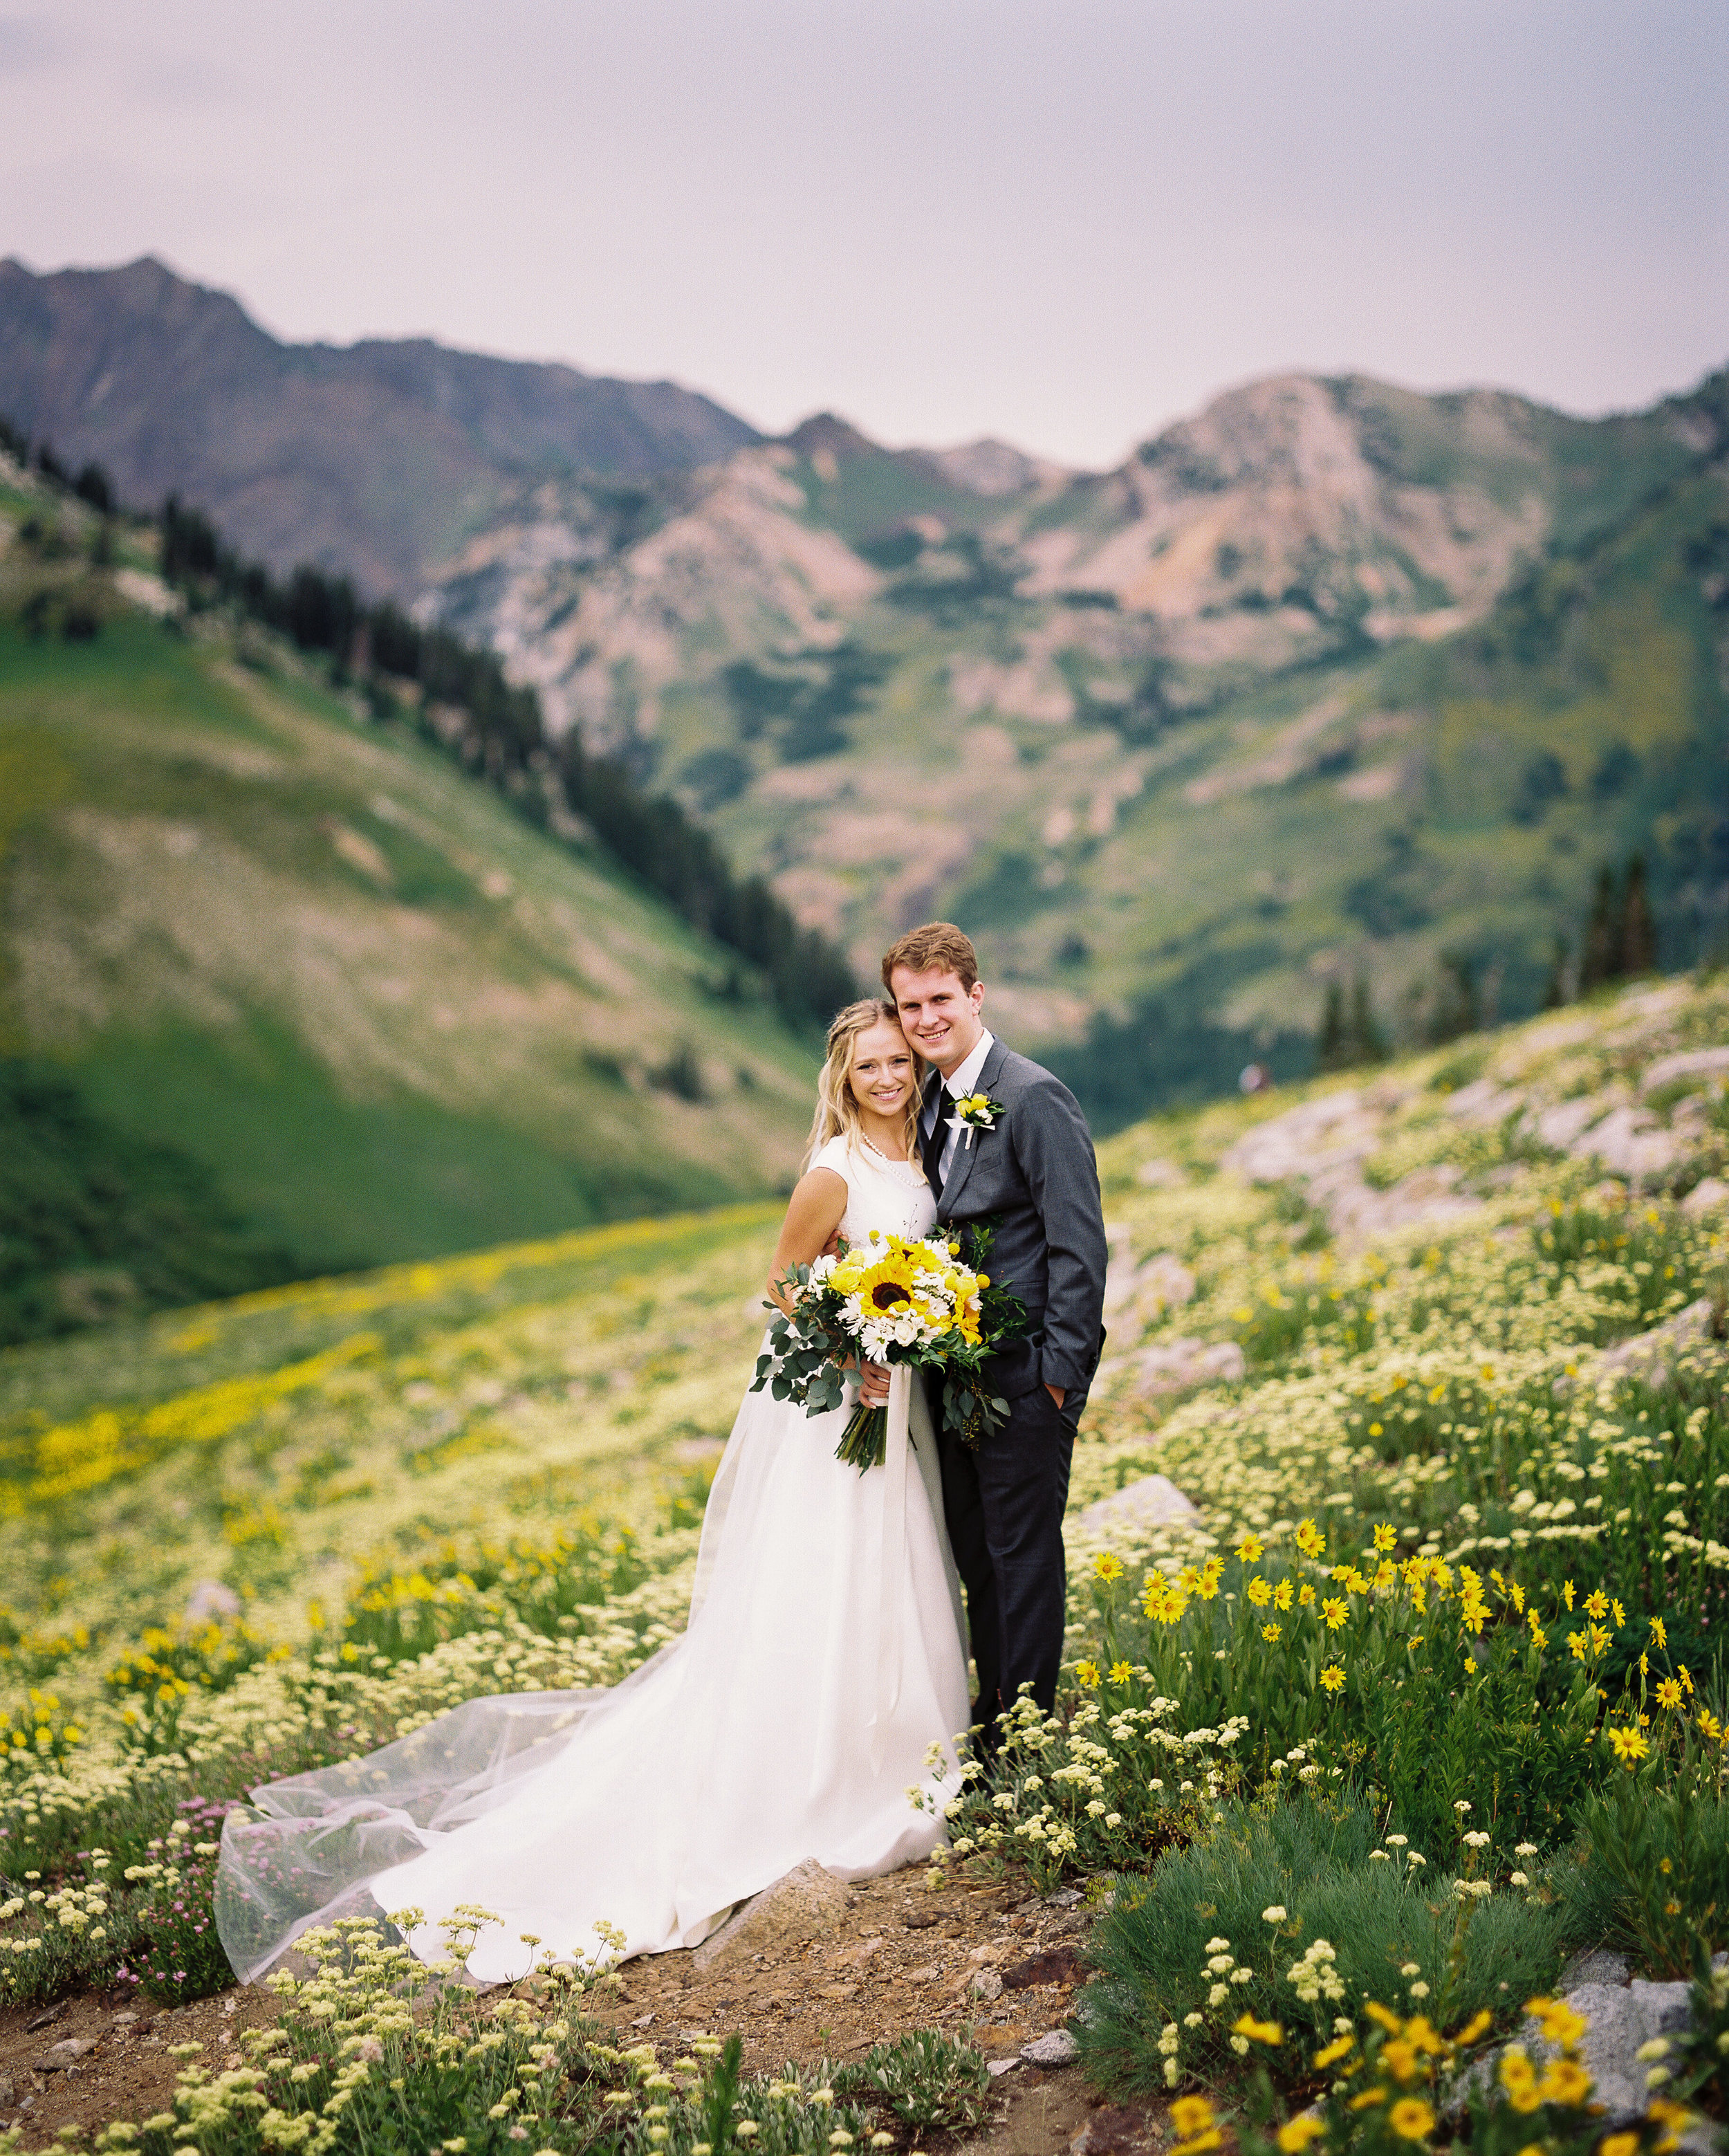 Dan Page Photography, Utah Wedding Photographer